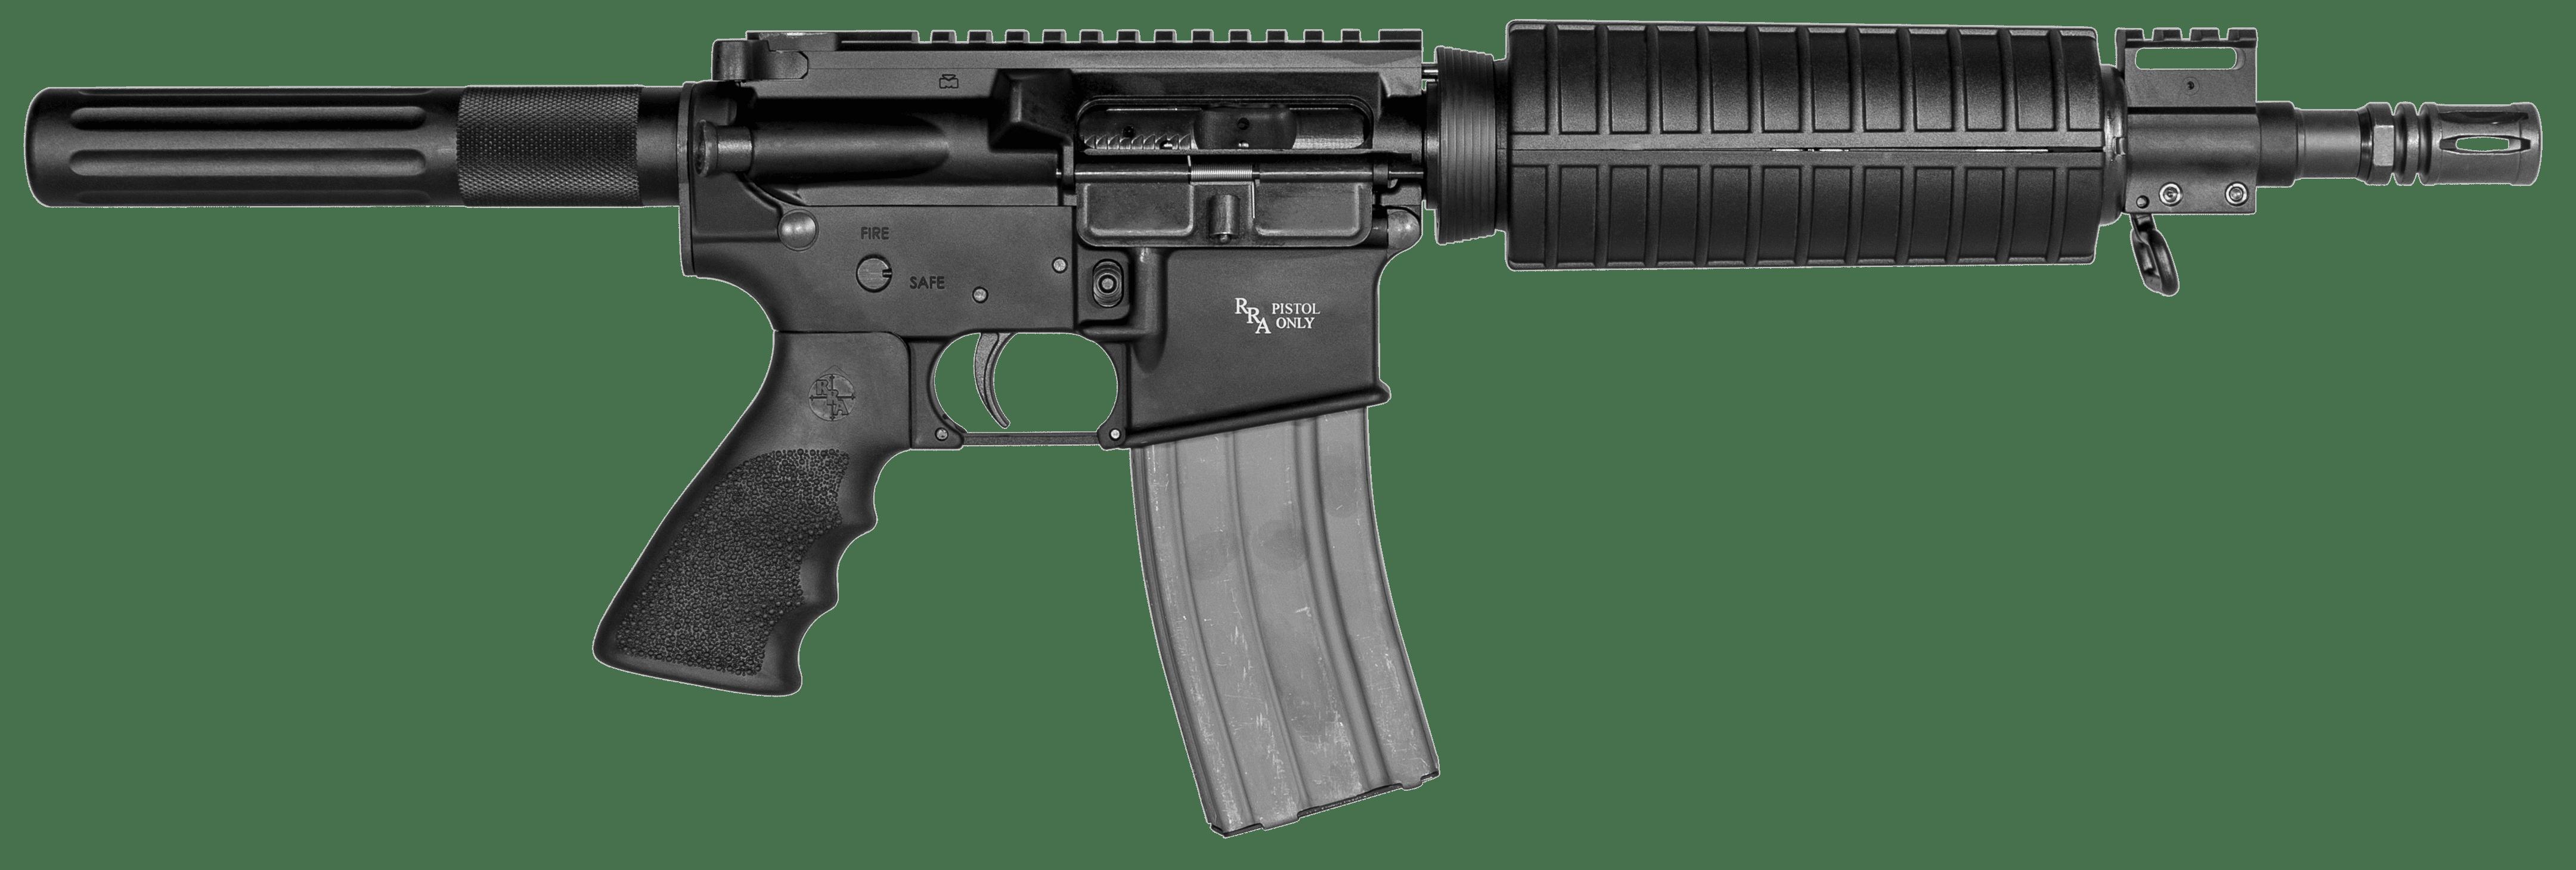 "Rock River Arms LAR-15 223 Rem,5.56 NATO 10.50"" 30+1 Black - Ed's Gun Shop"